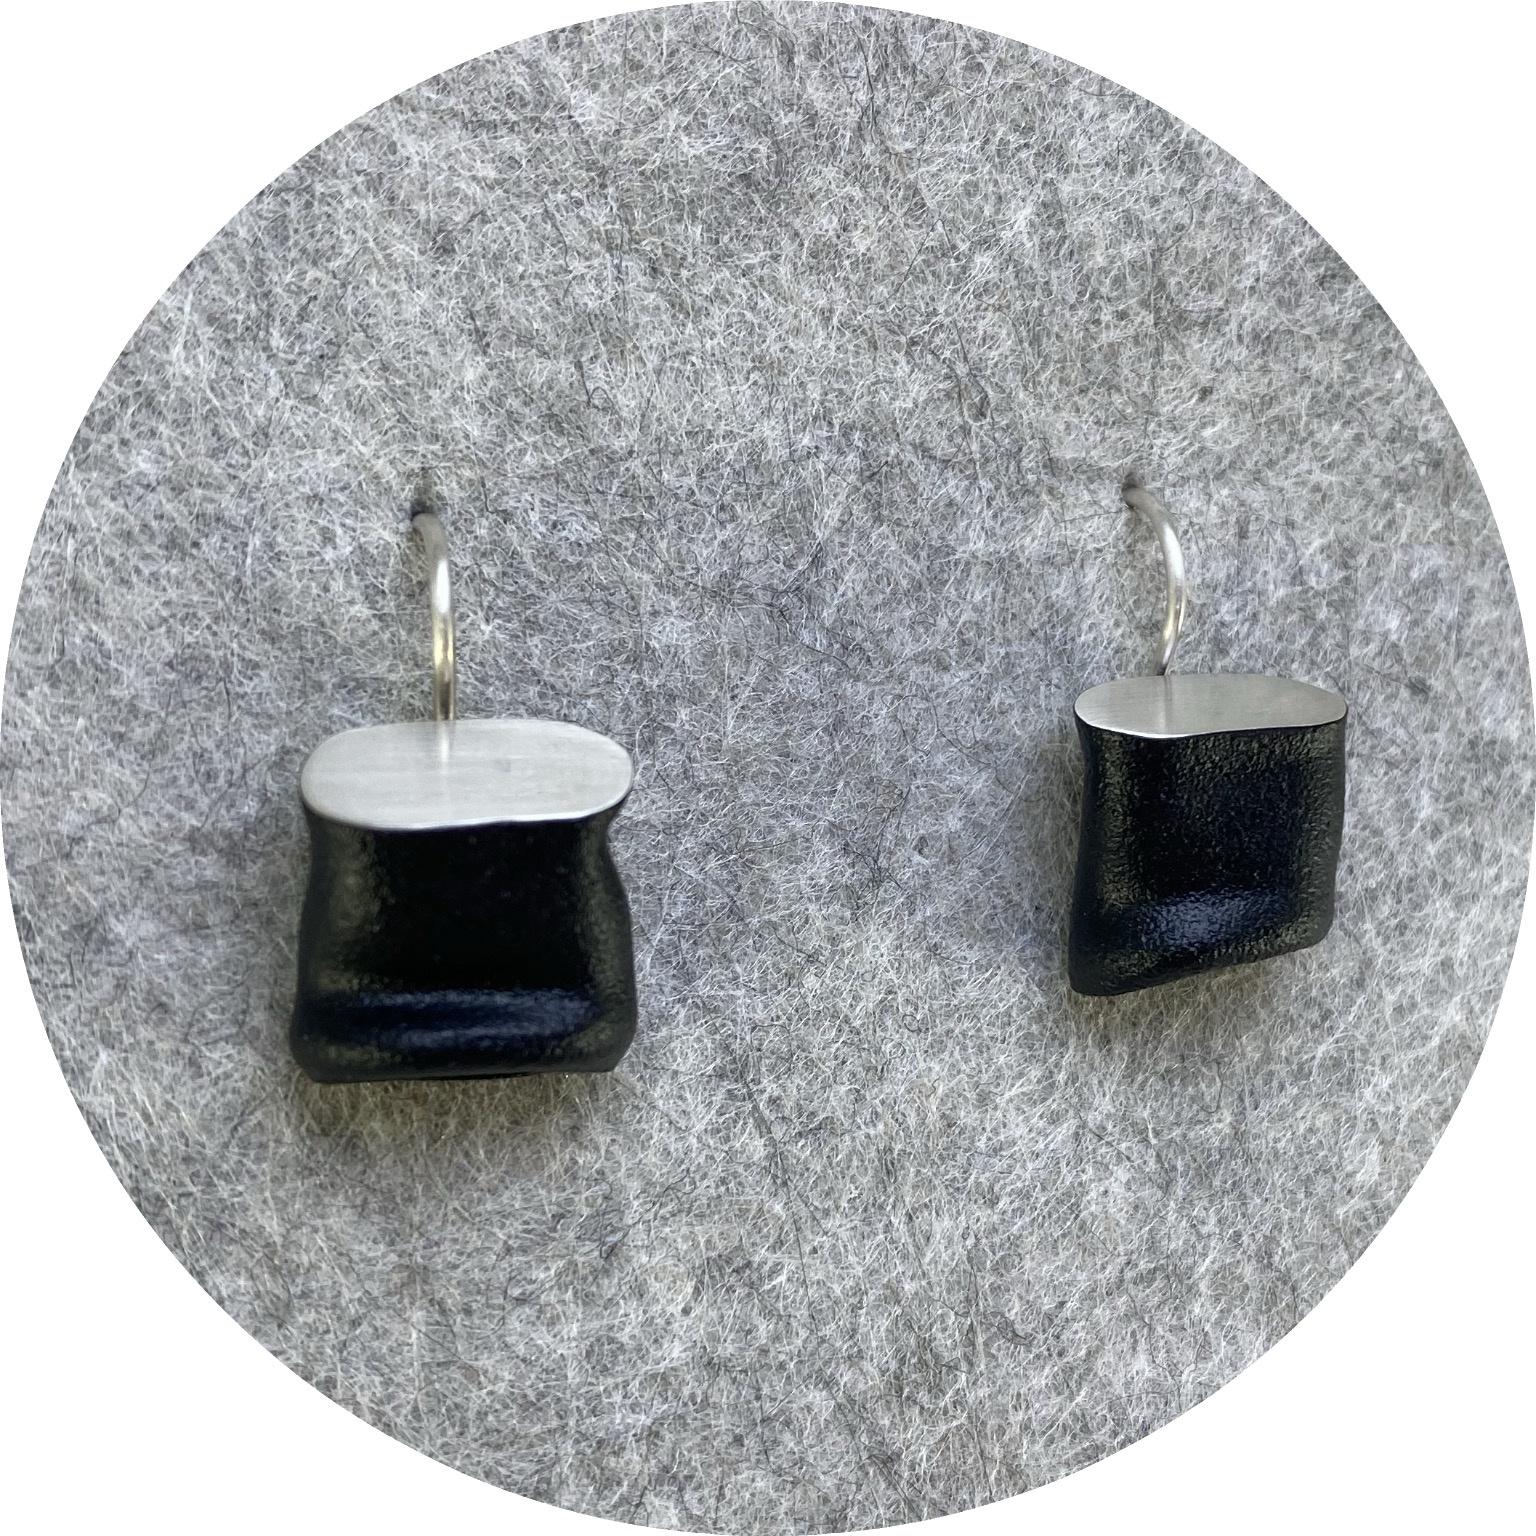 Robyn Clarke- Crushed matte black hook earrings. Copper and sterling silver.